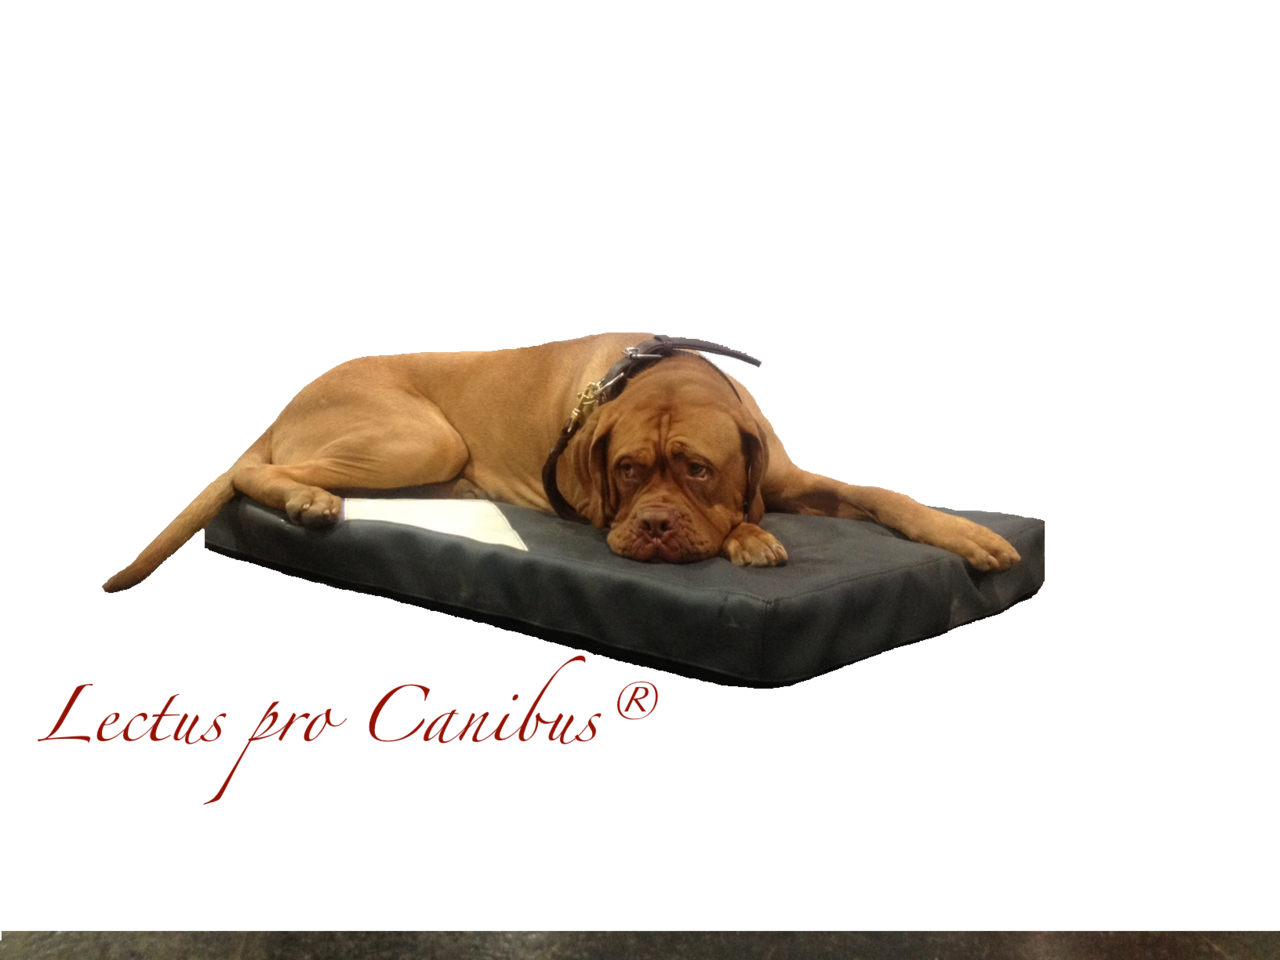 Orthomed Hundebett von Lectus pro canibus®